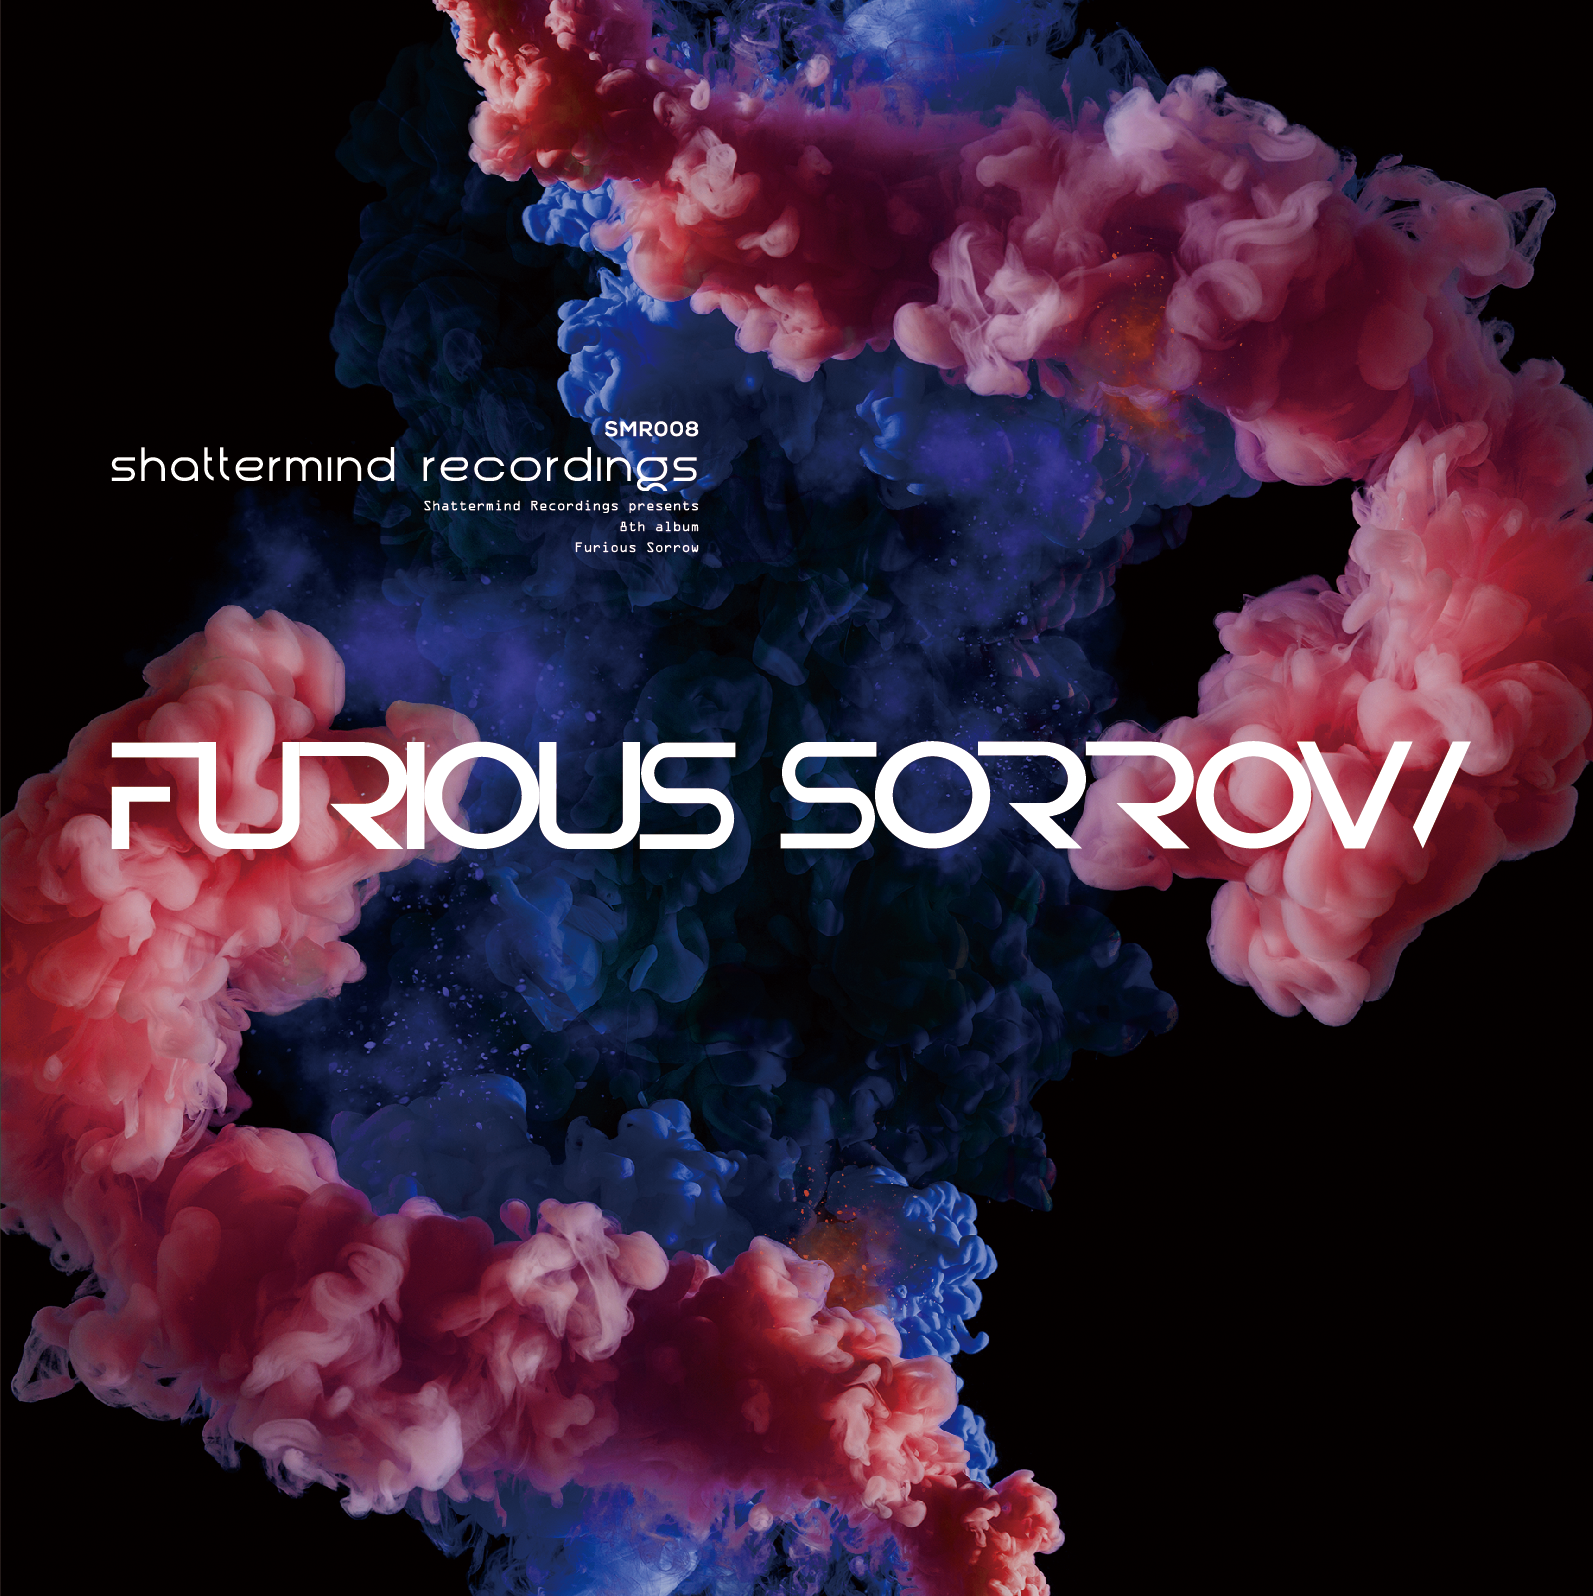 Furious Sorrow